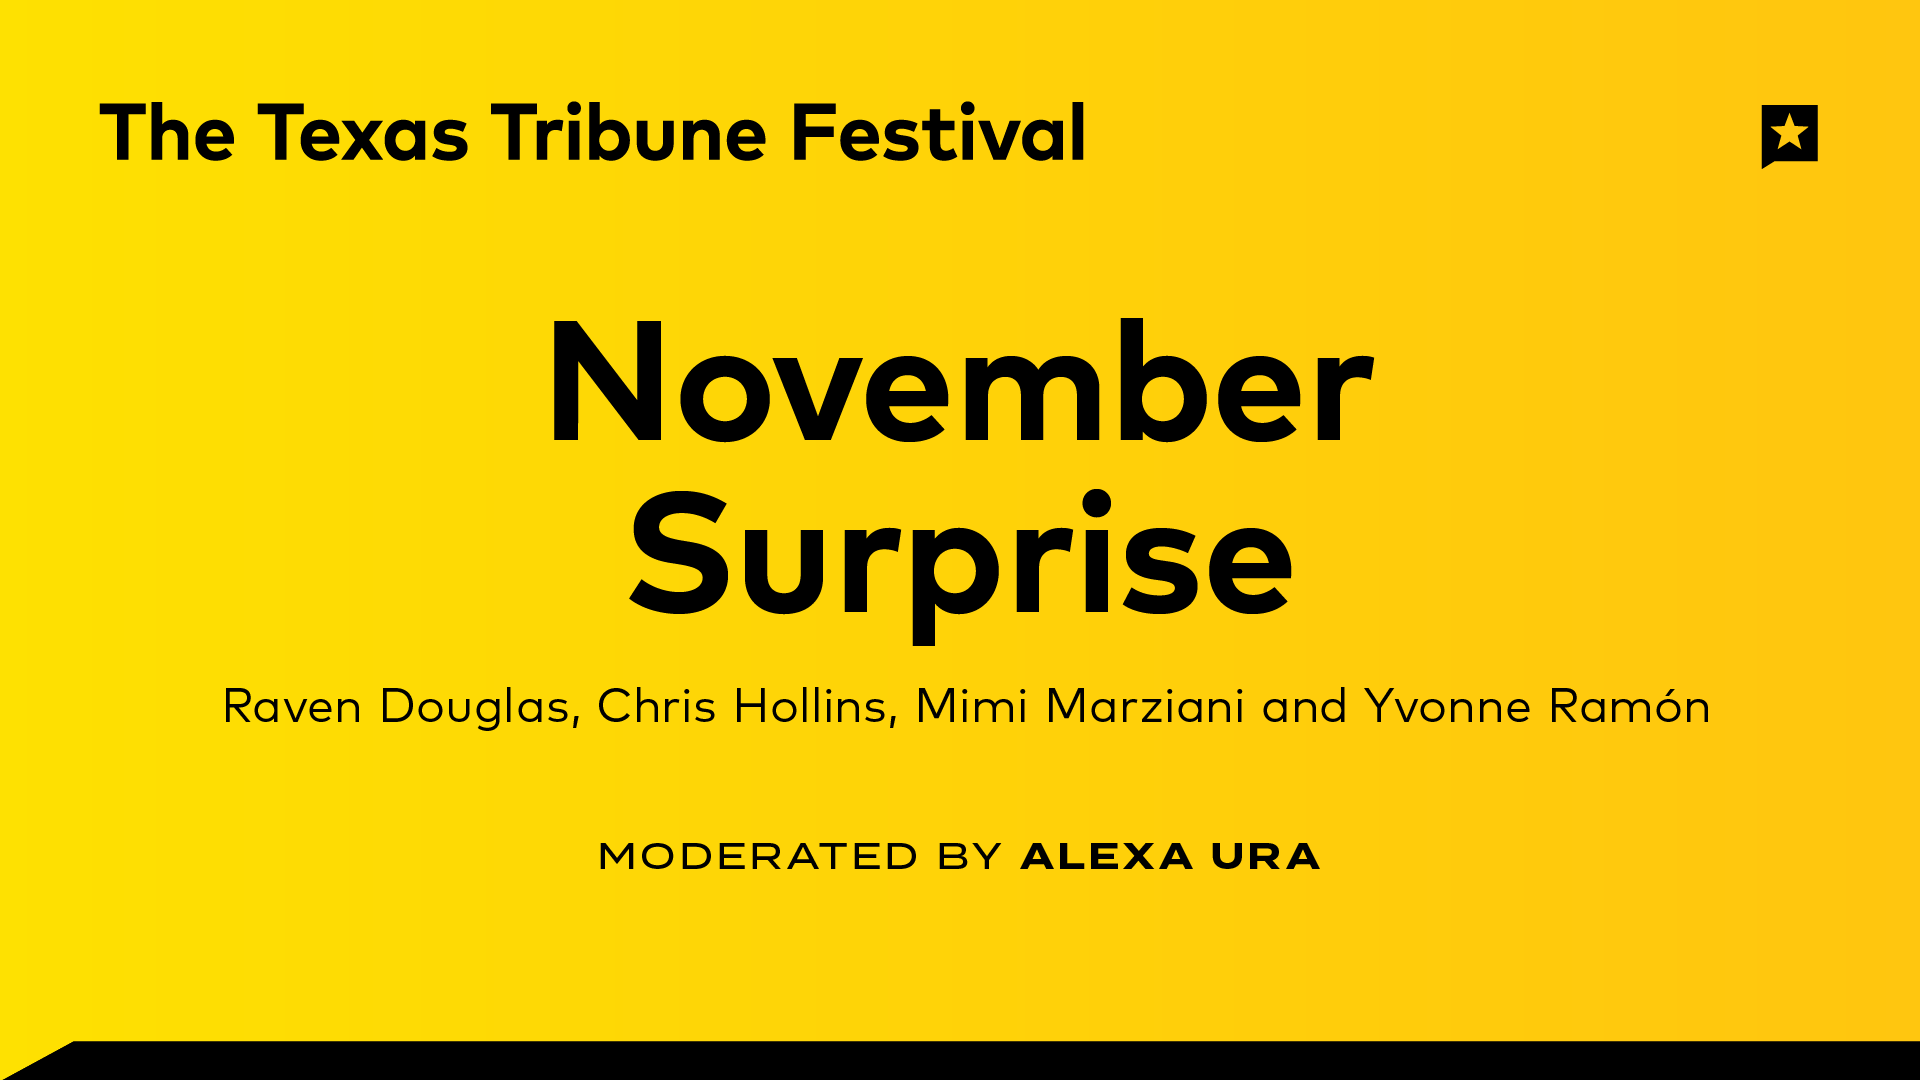 November Surprise